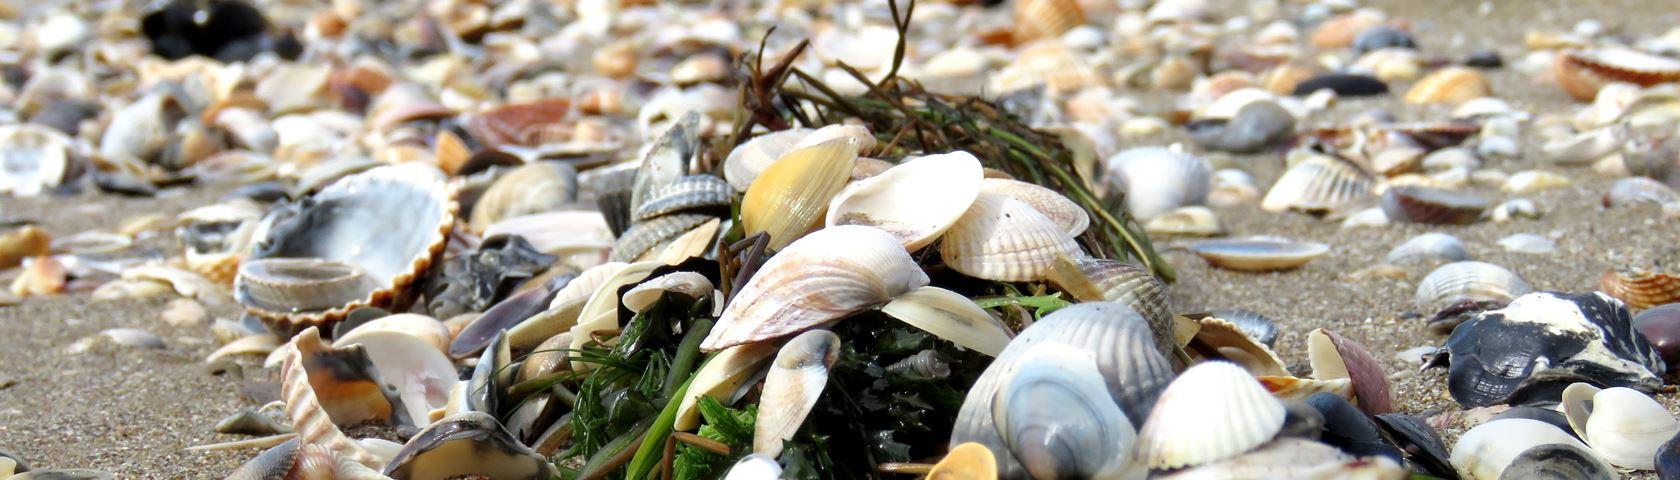 Shells on Cavallonie Beach